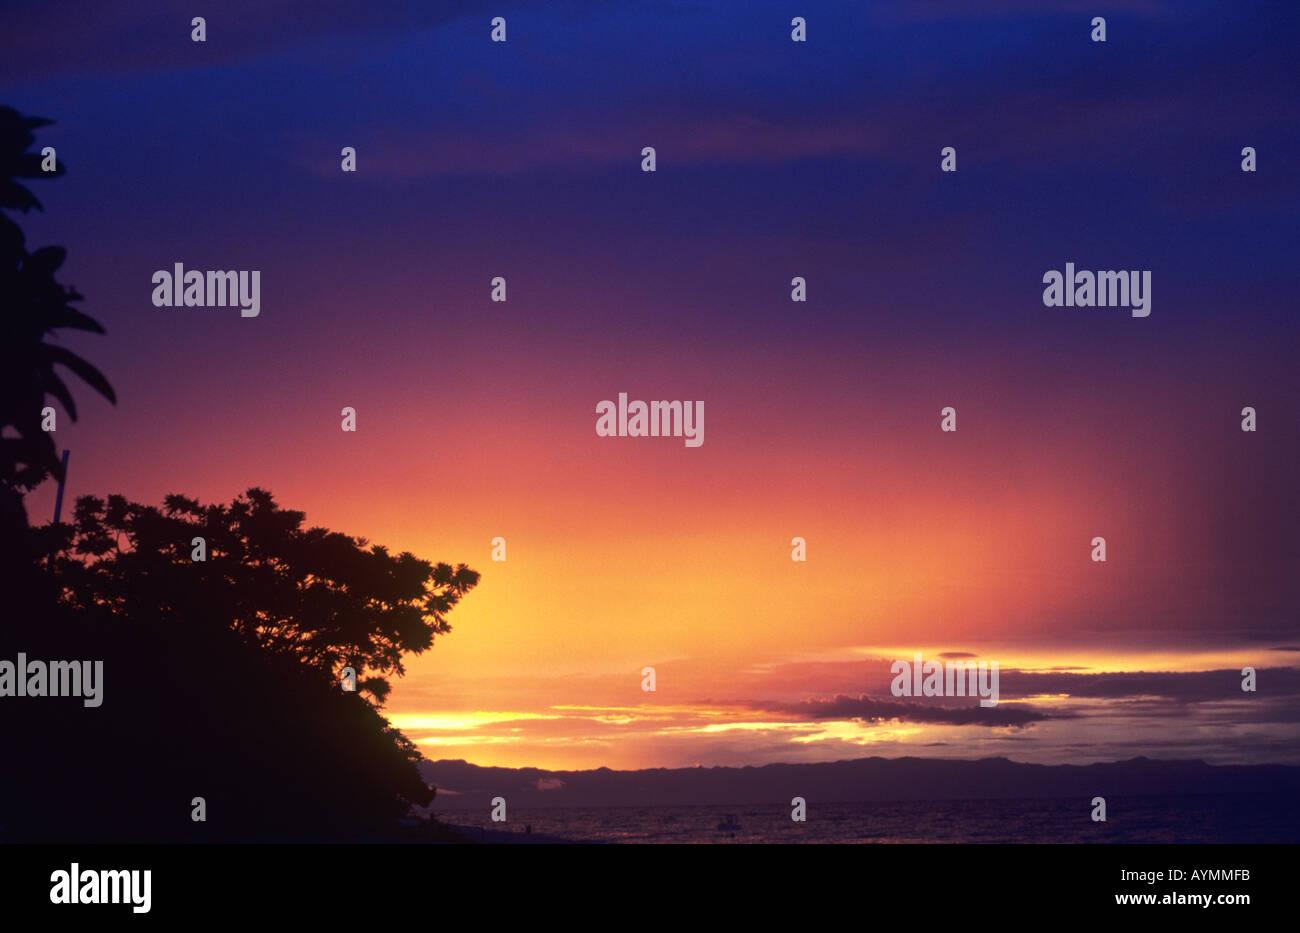 Sonnenuntergang - in der Nähe des Dorfes Chembe, Cape Maclear, Lake Malawi, Malawi Stockfoto